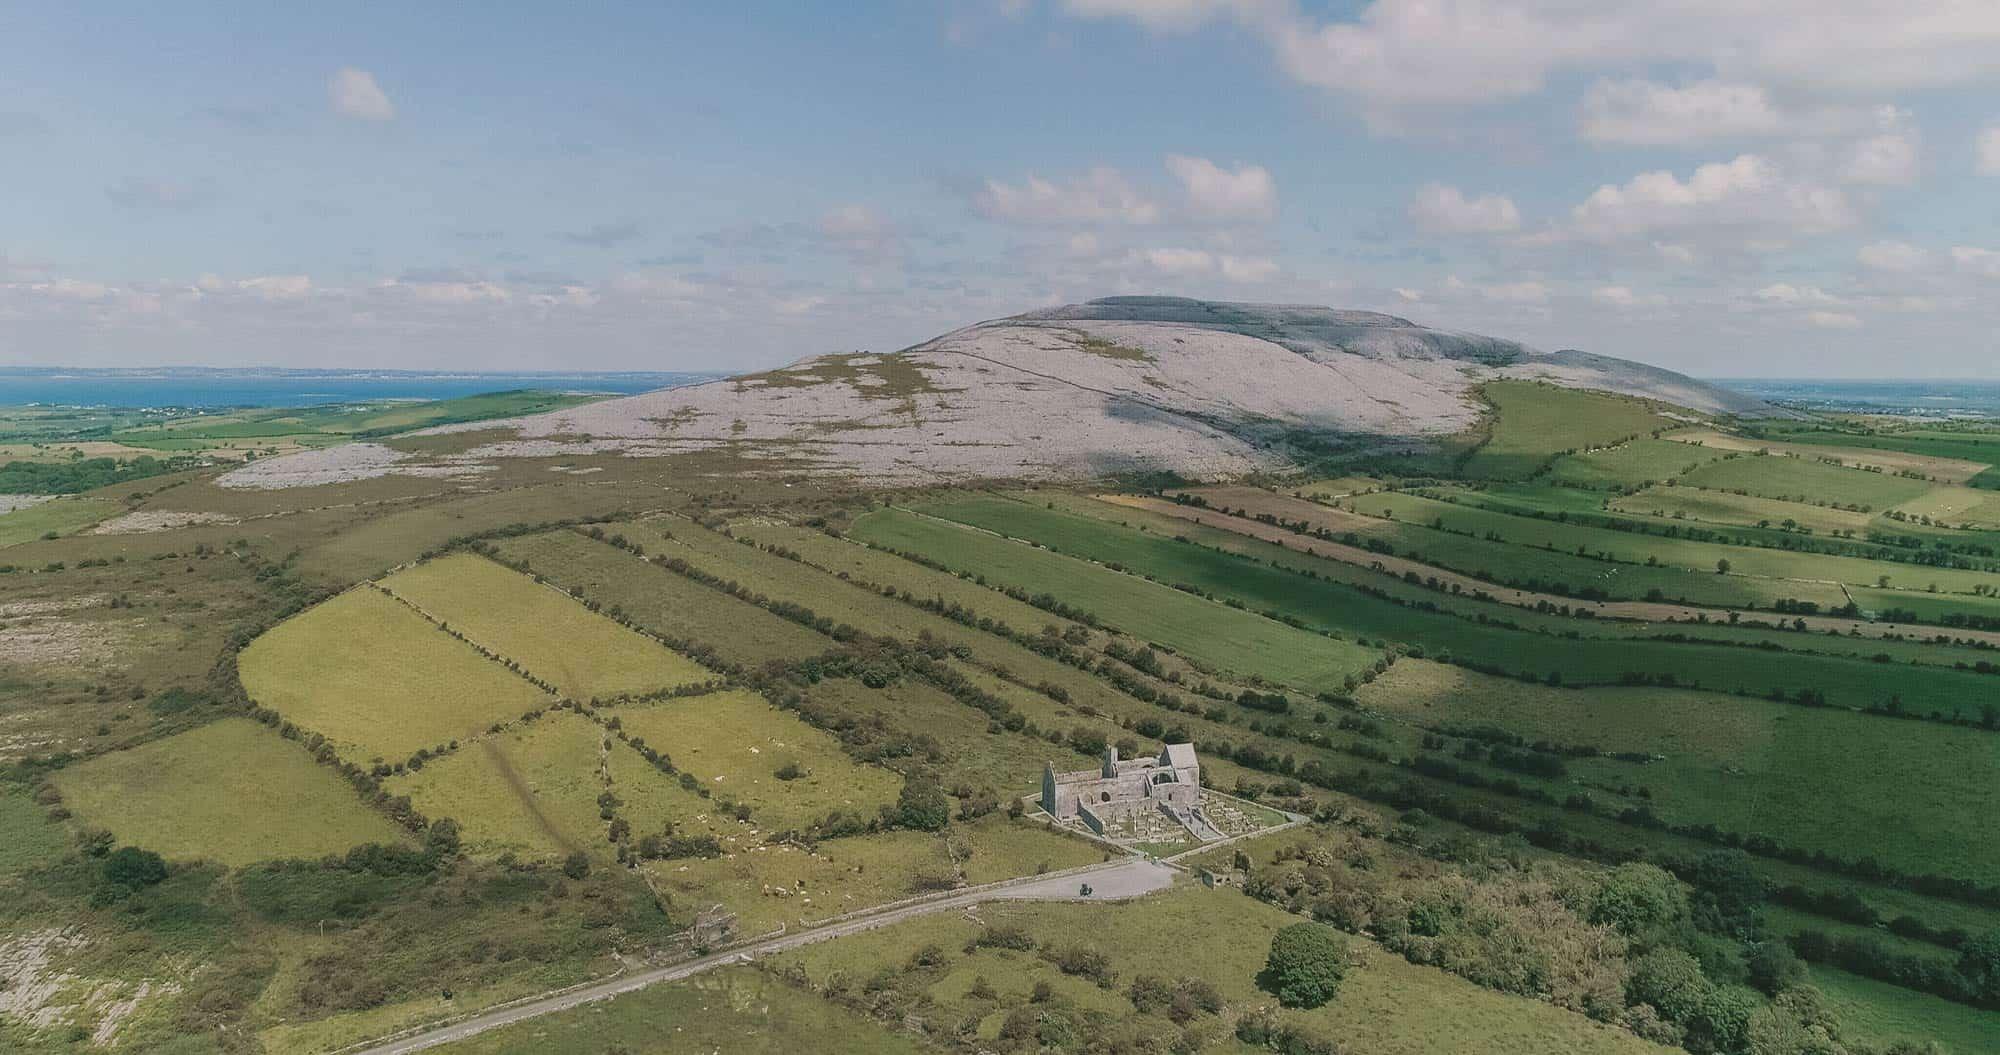 Cliffs of Moher Elopement Corcomroe and The Burren